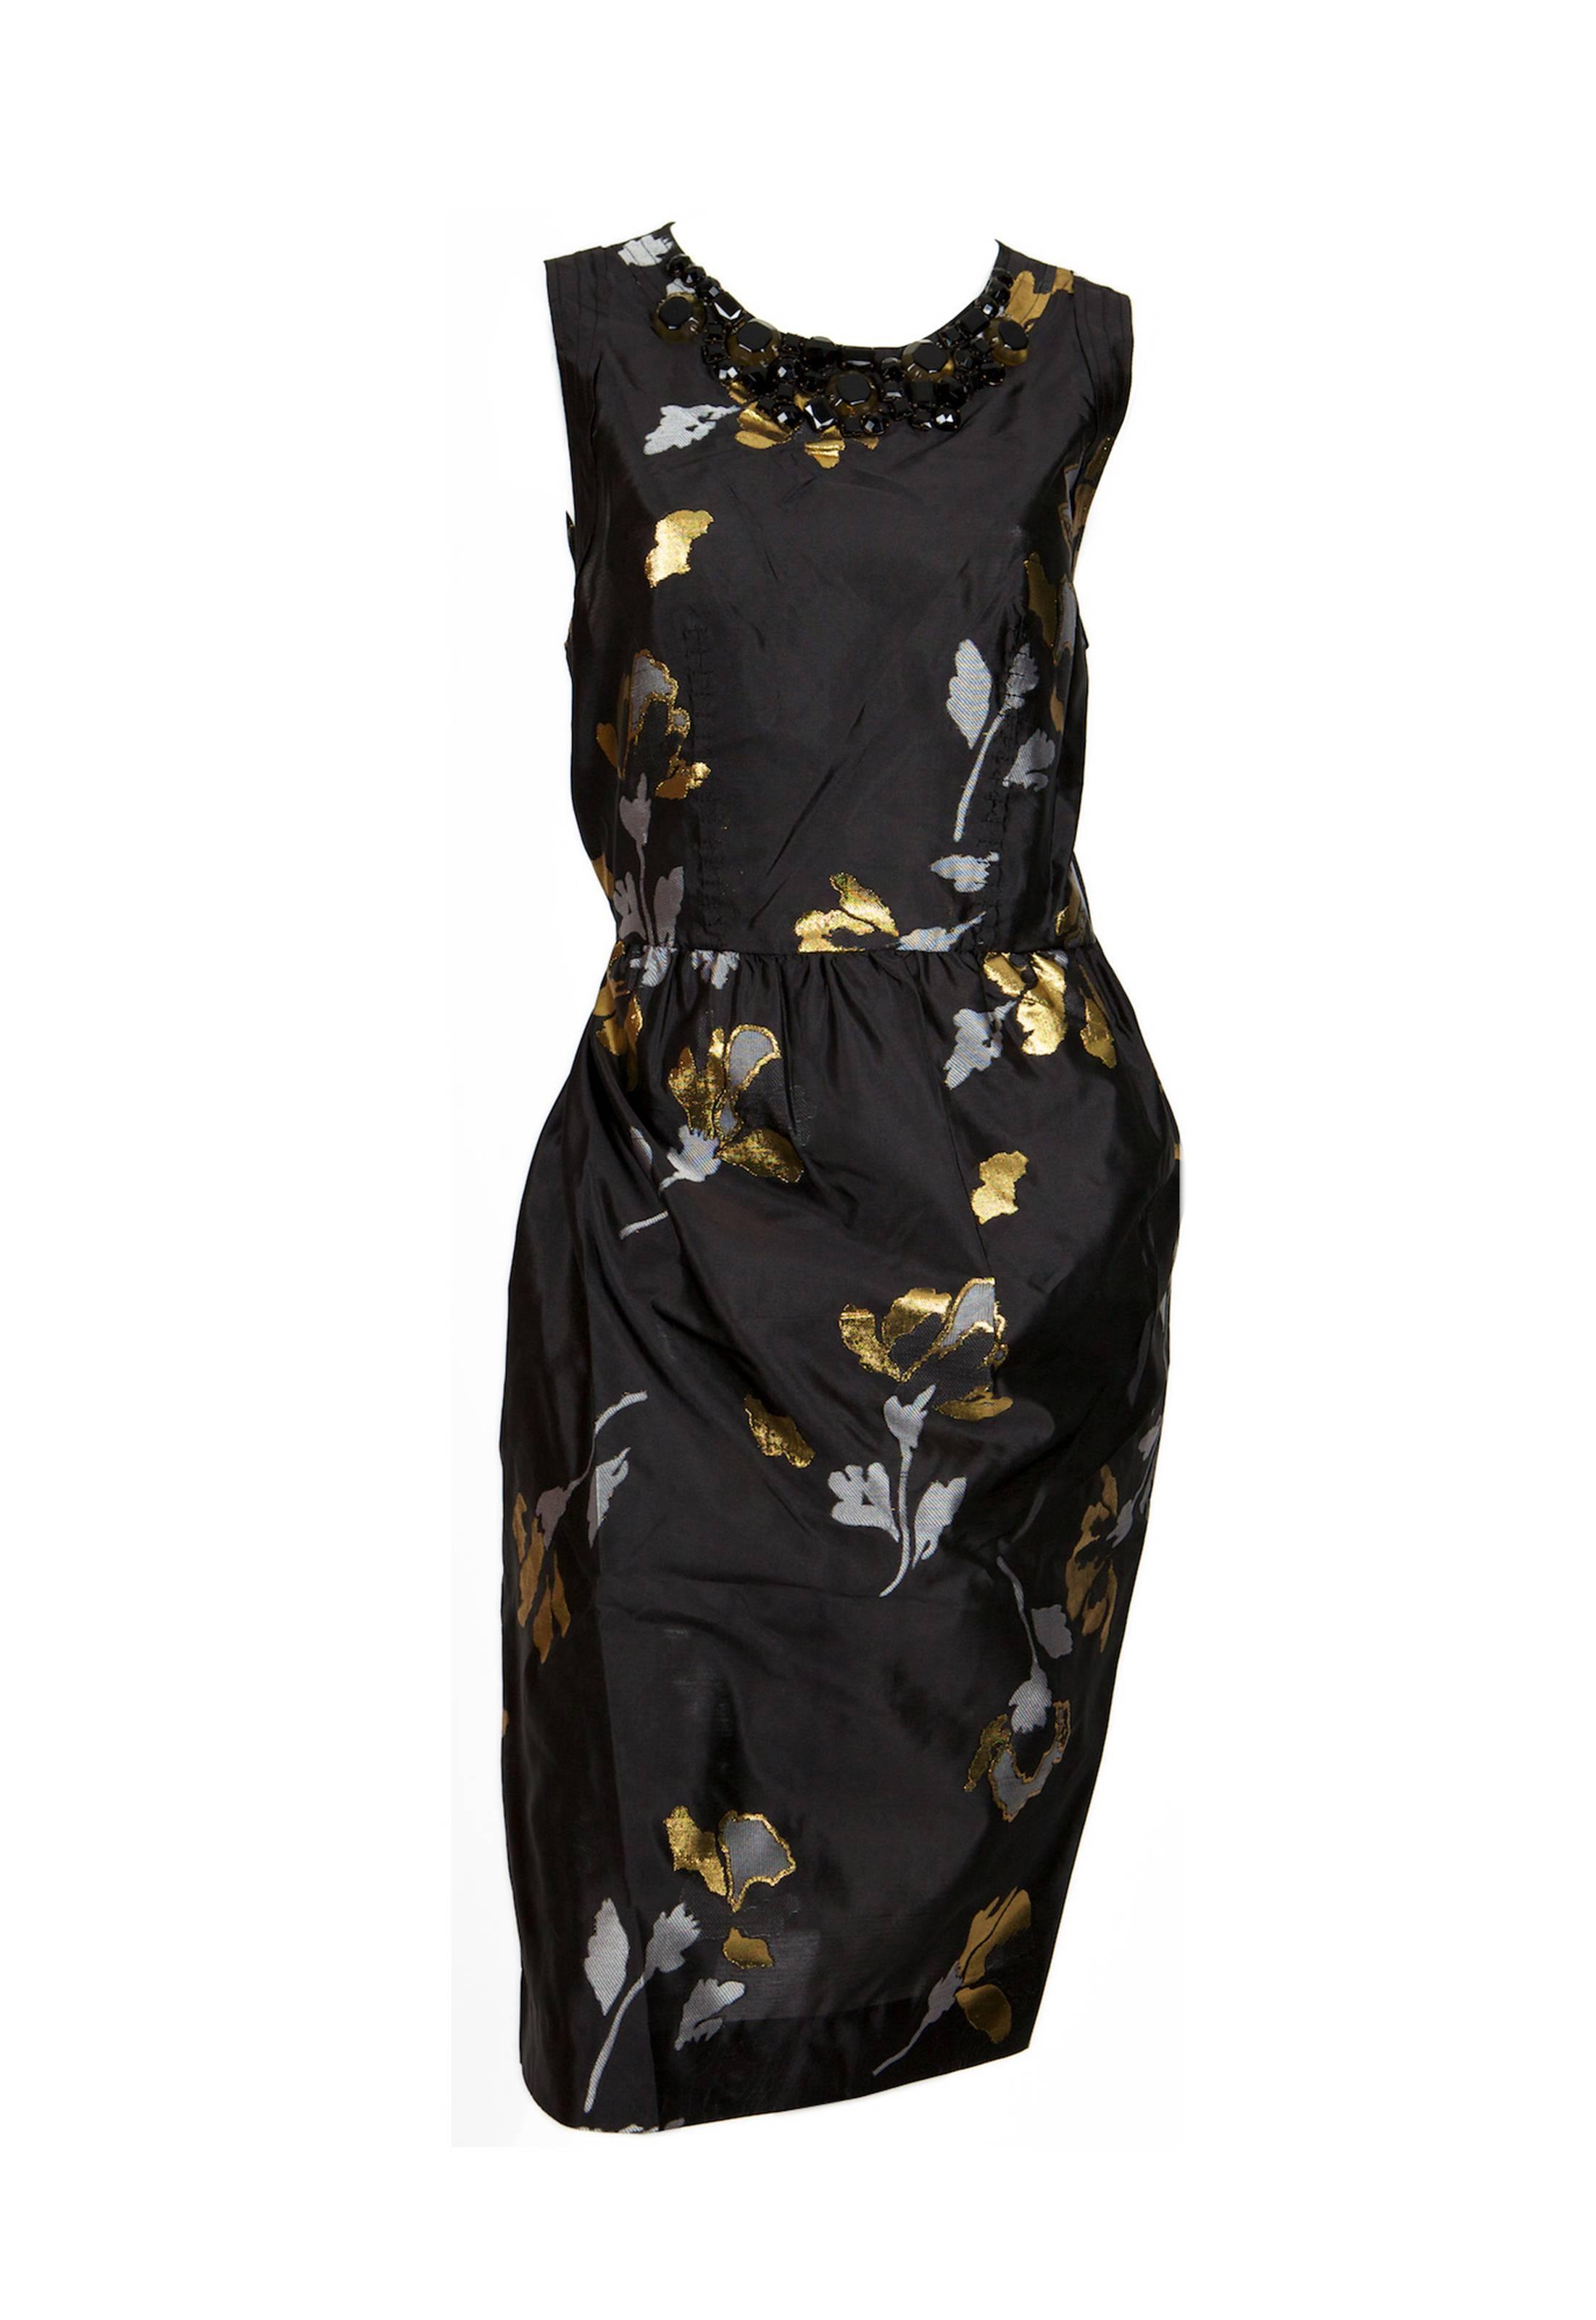 Marni_Special_Dress Created for Dubai Boutique